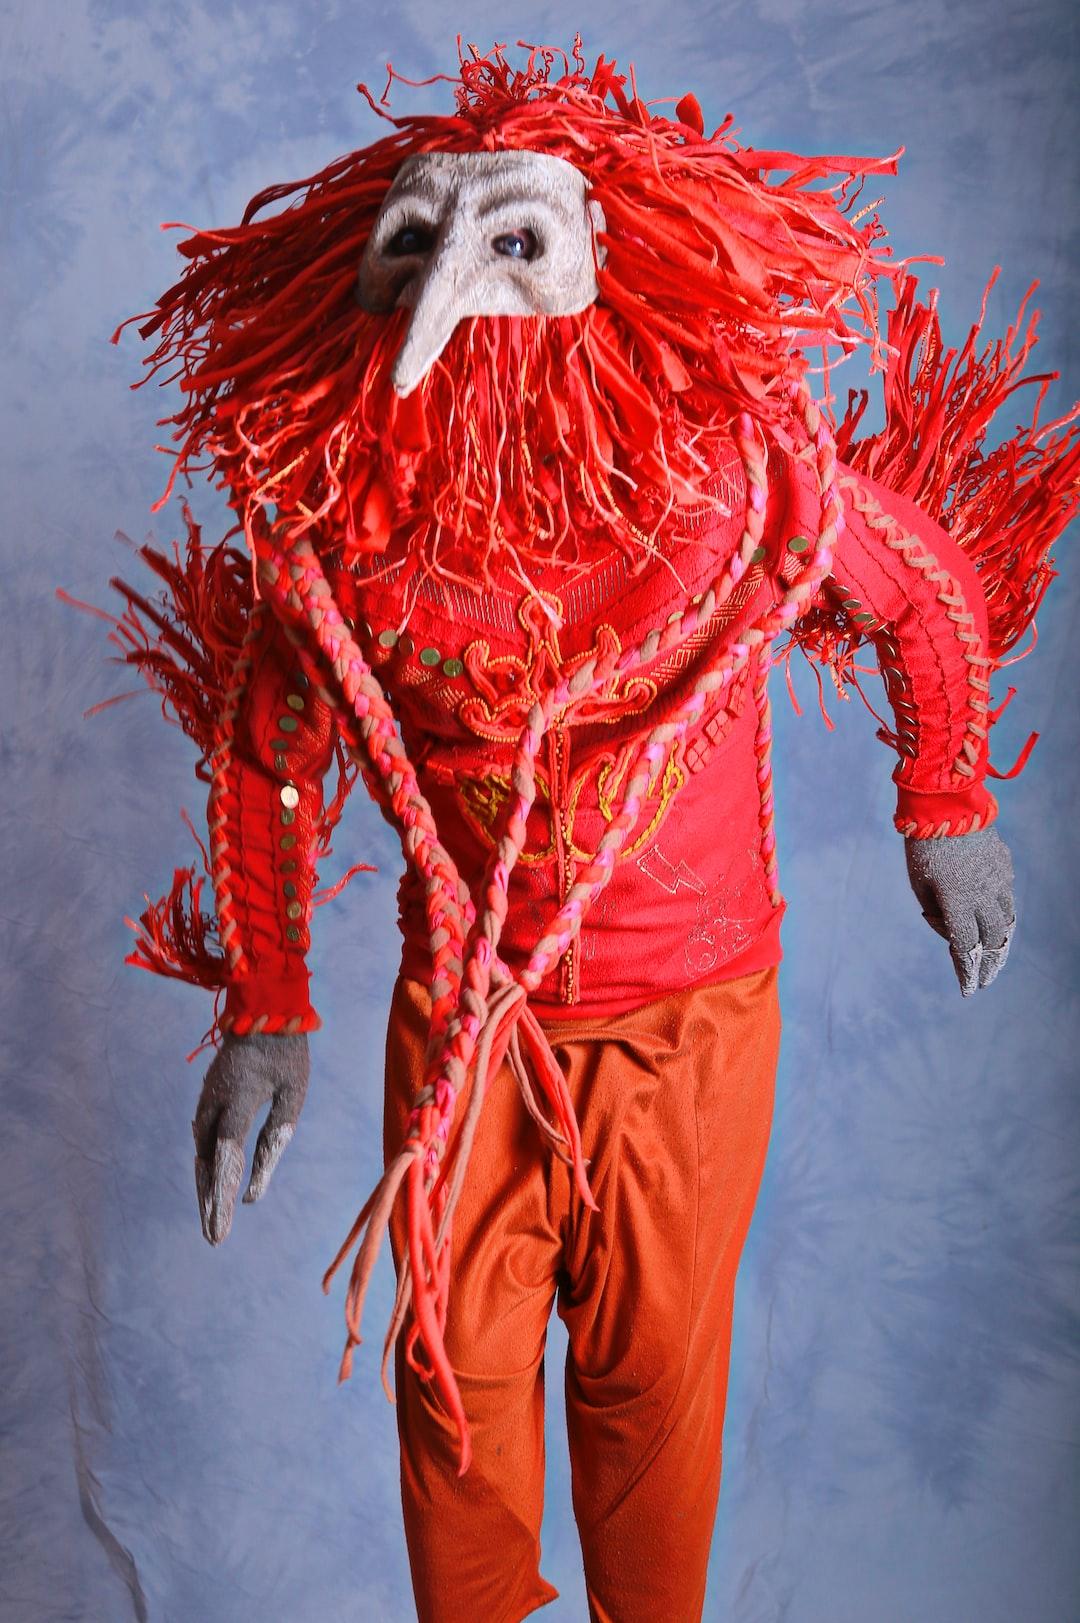 Carnival, shamanistic costume of a red rooster. • Карнавальный, шаманский костюм красного петуха.